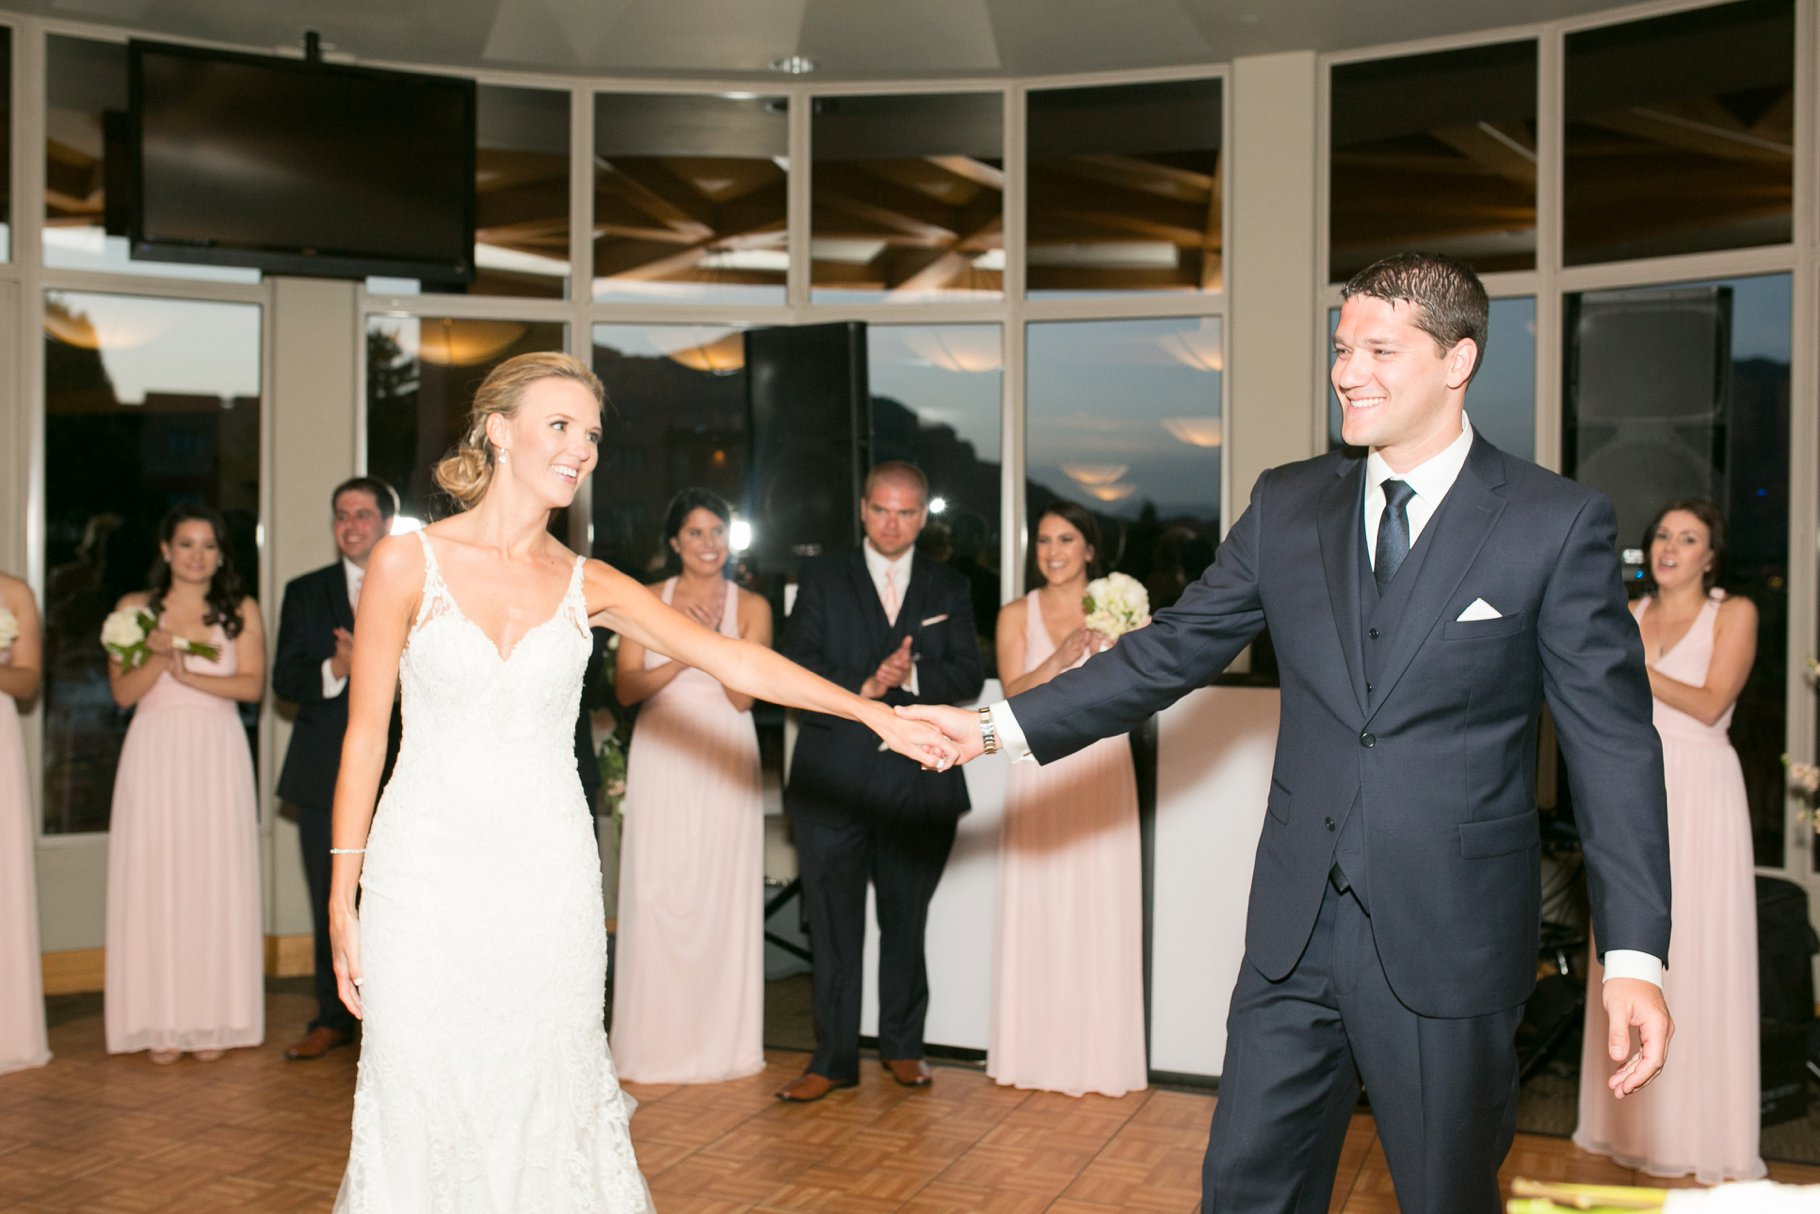 sedona wedding-503_GRETCHEN WAKEMAN PHOTOGRAPHY.jpg